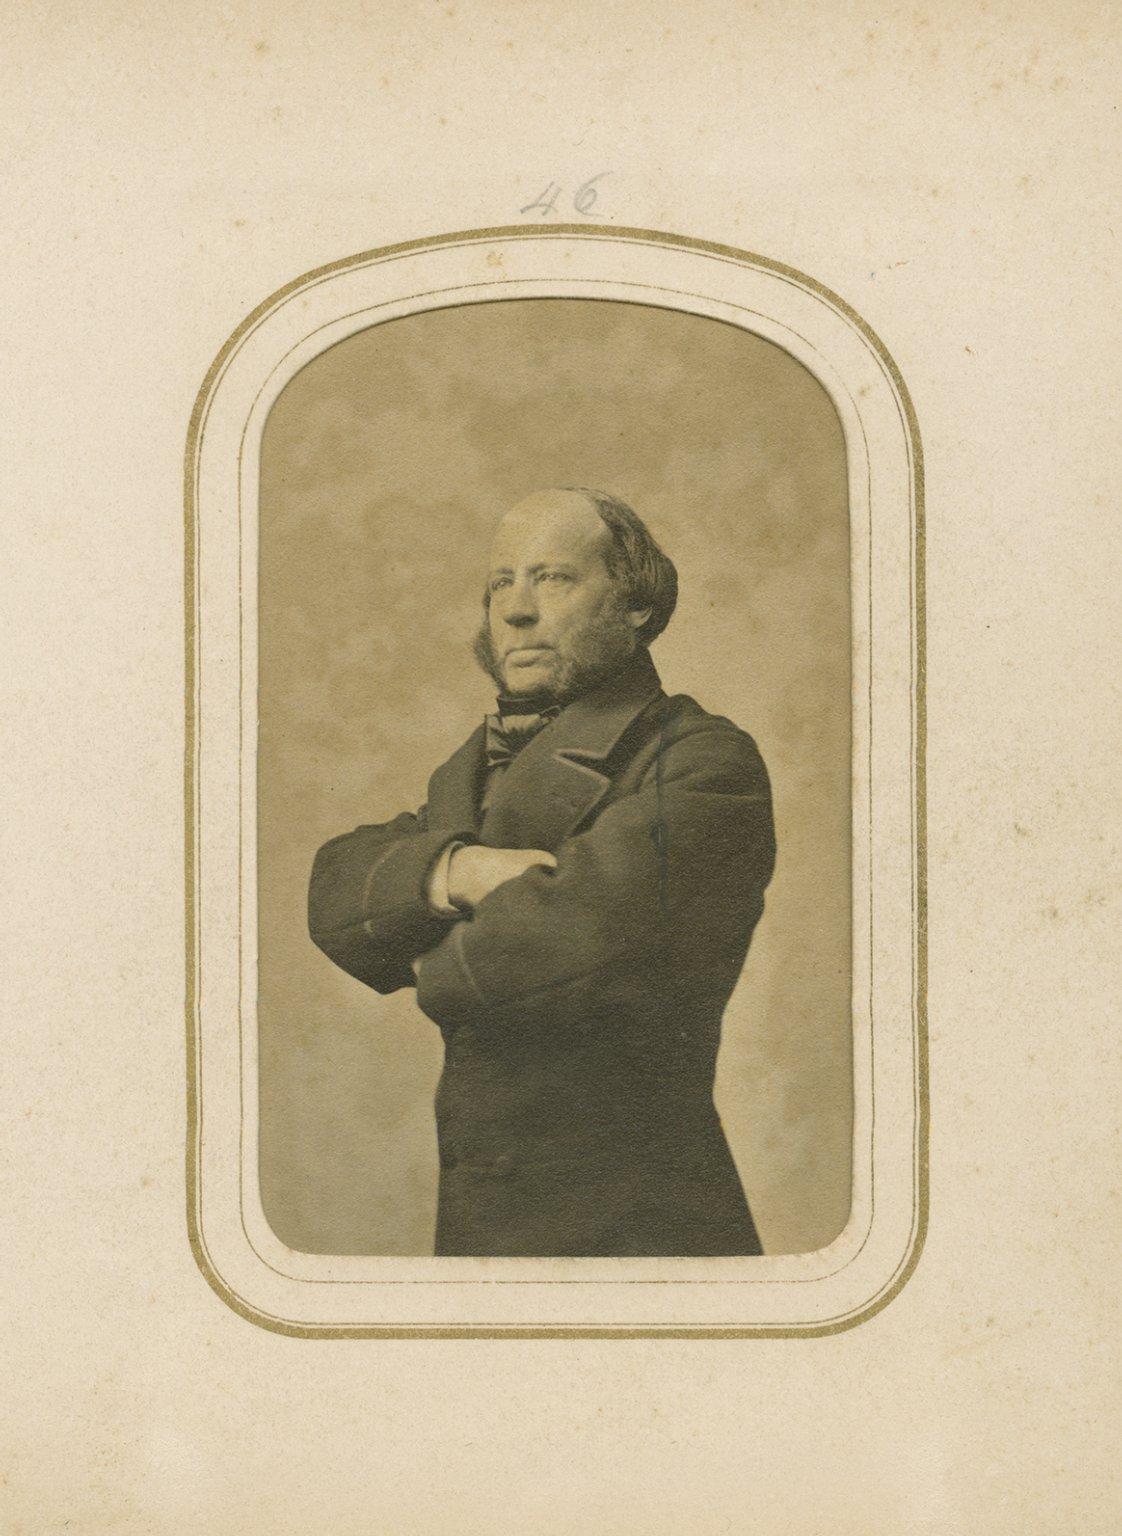 Capt. John Ericsson